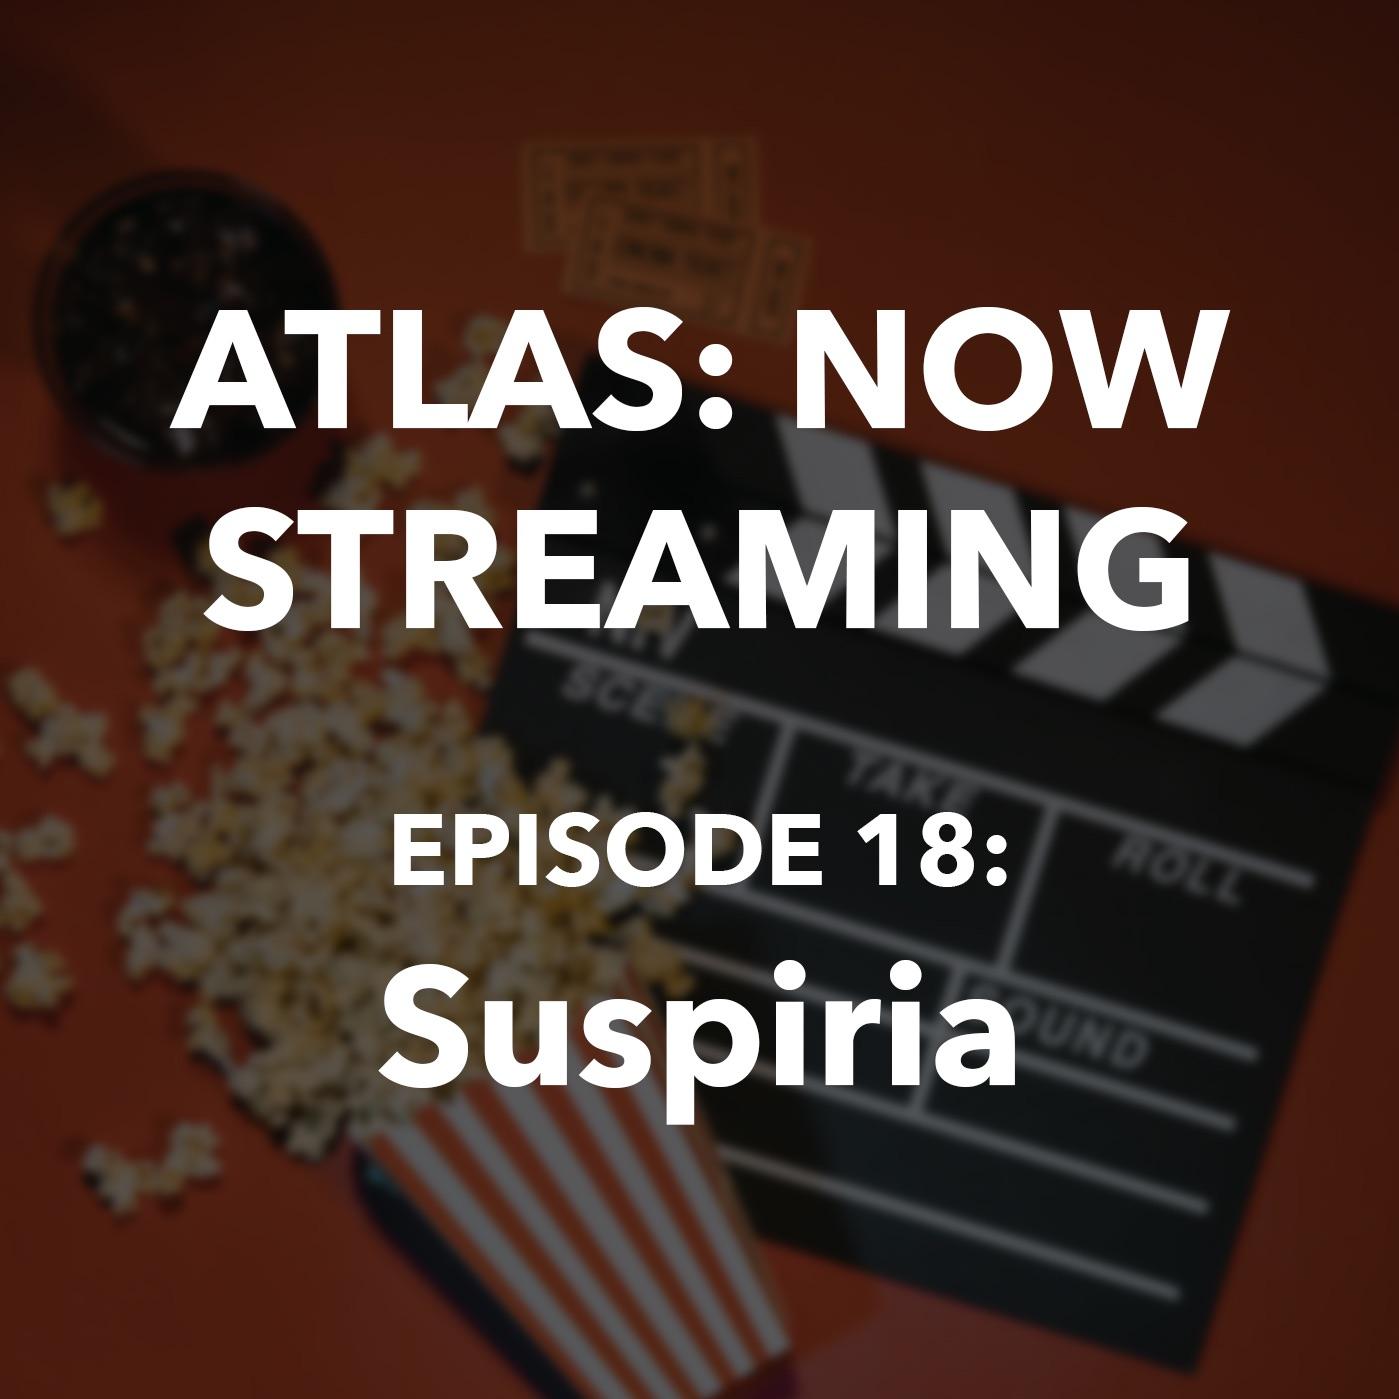 Atlas: Now Streaming Episode 18 - Suspiria